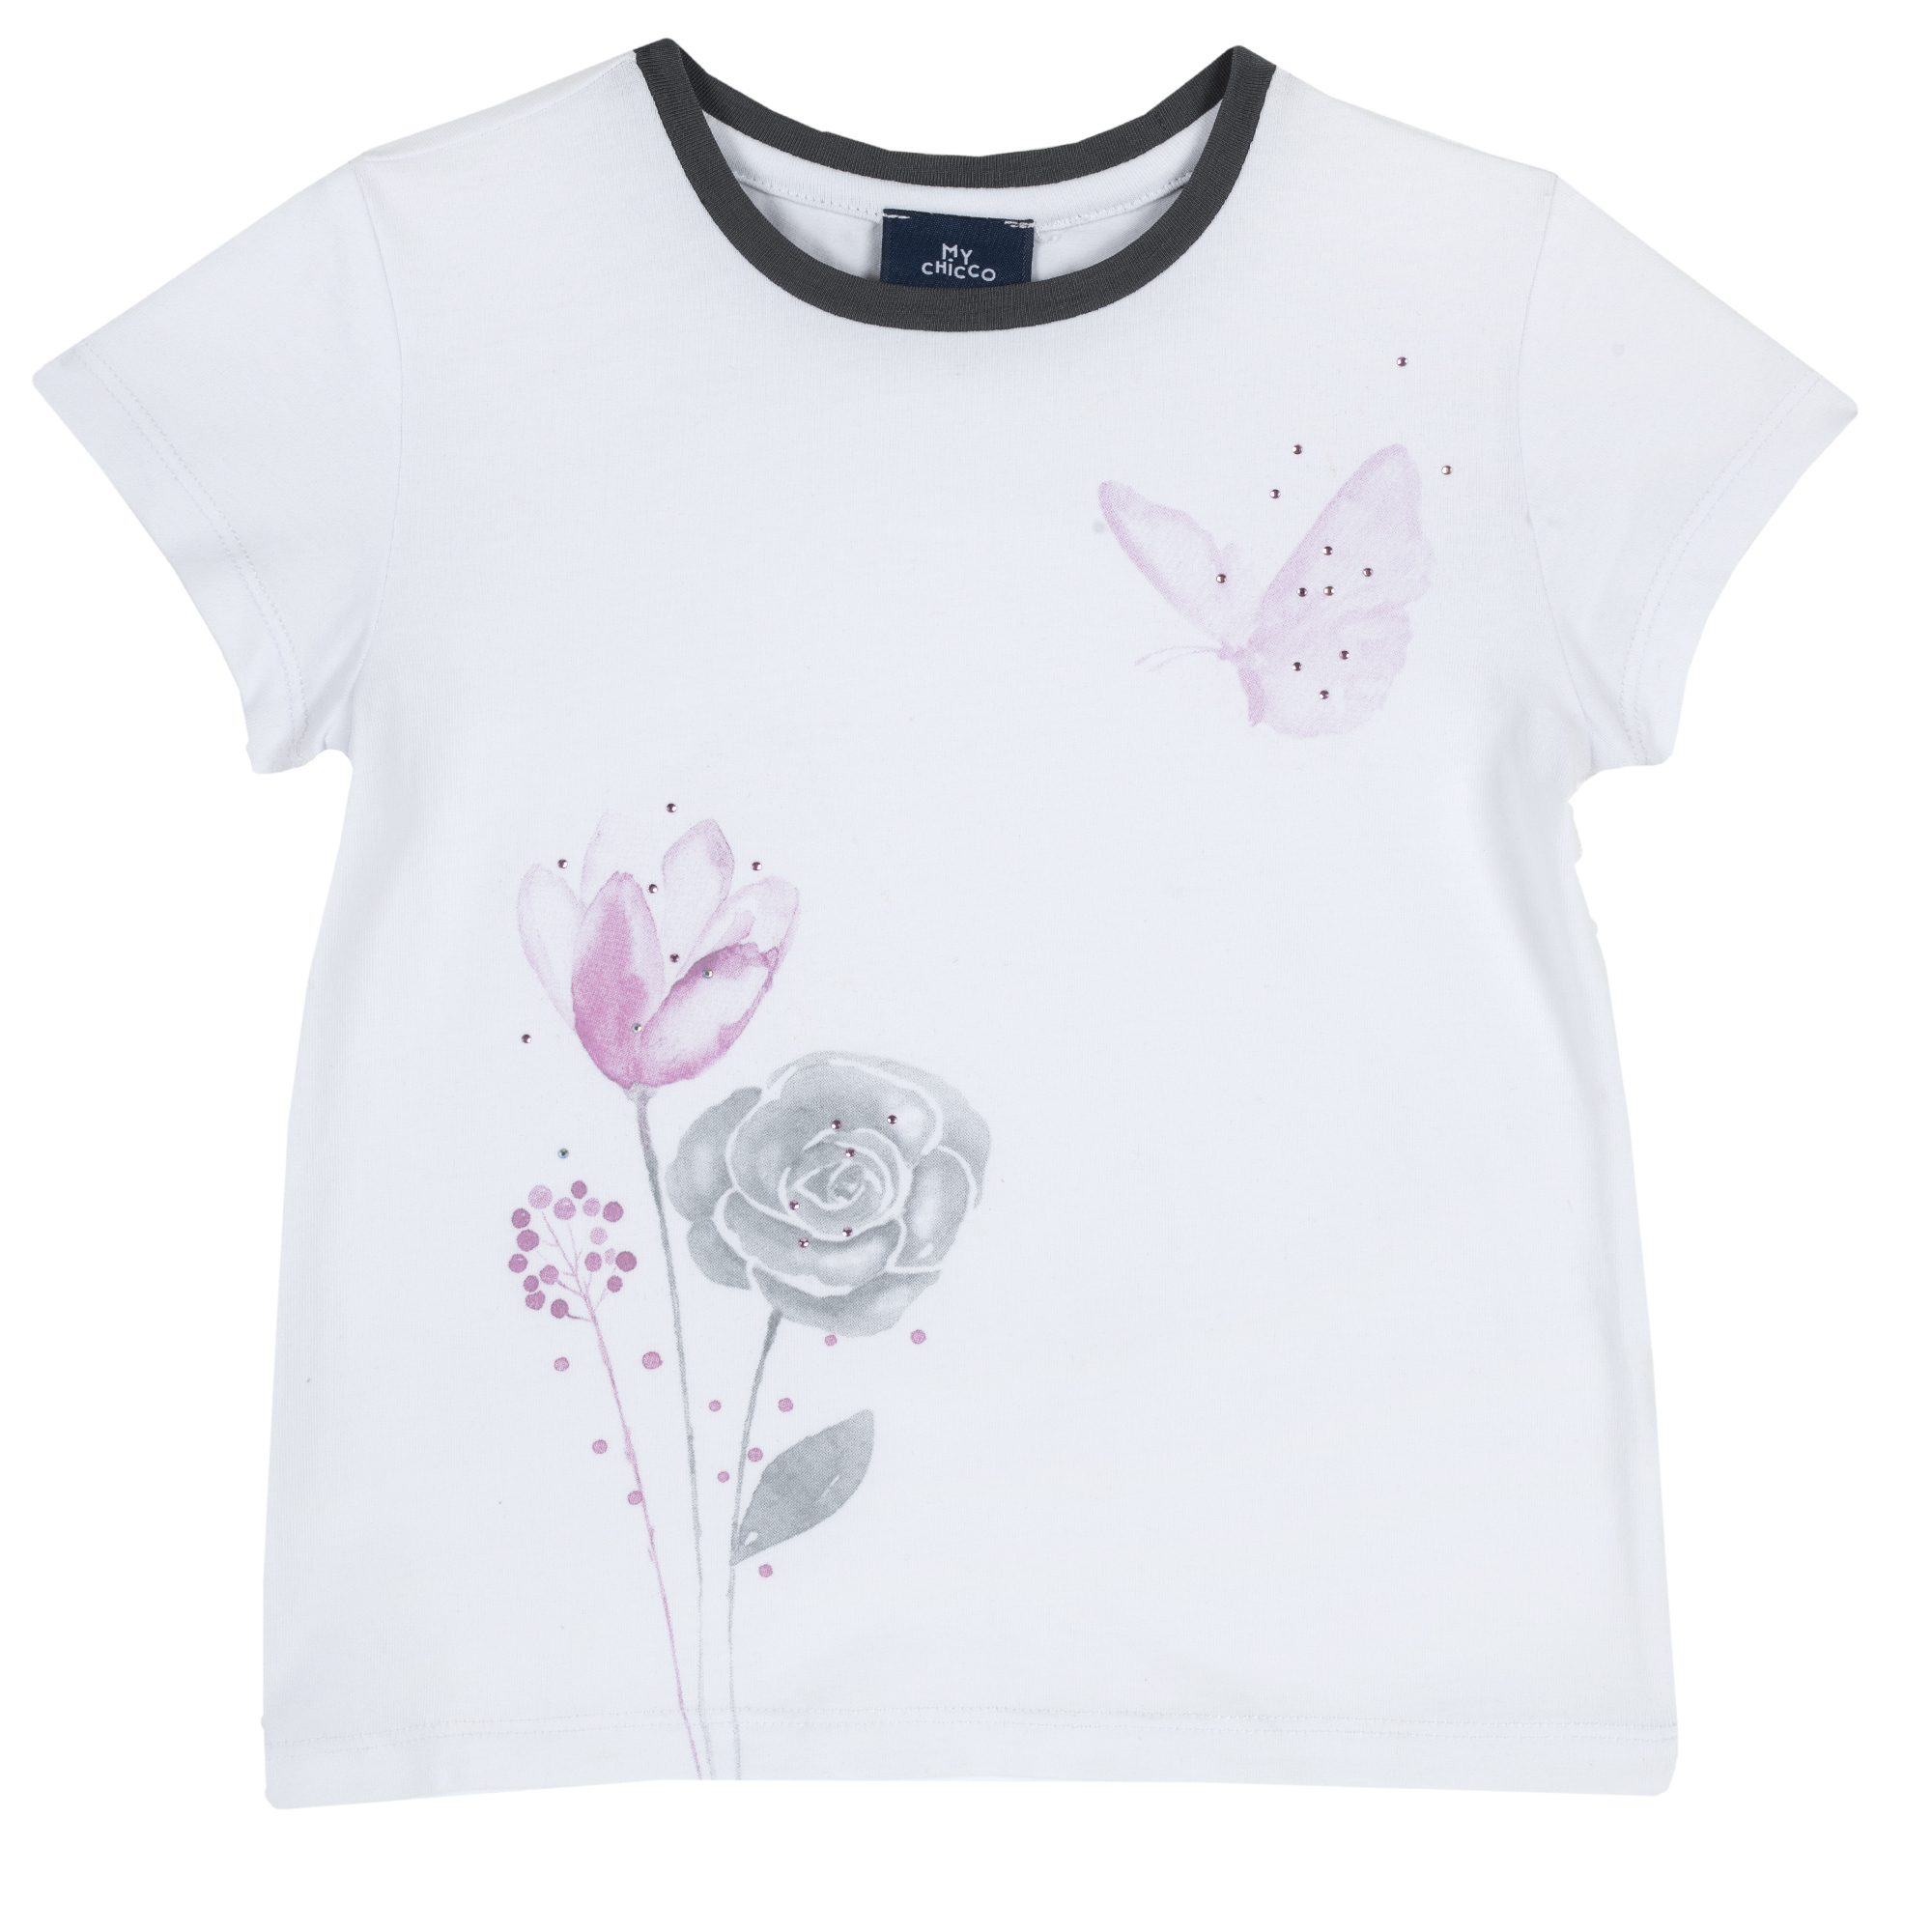 Tricou Copii Chicco, Maneca Scurta, Flori Imprimate, 06636